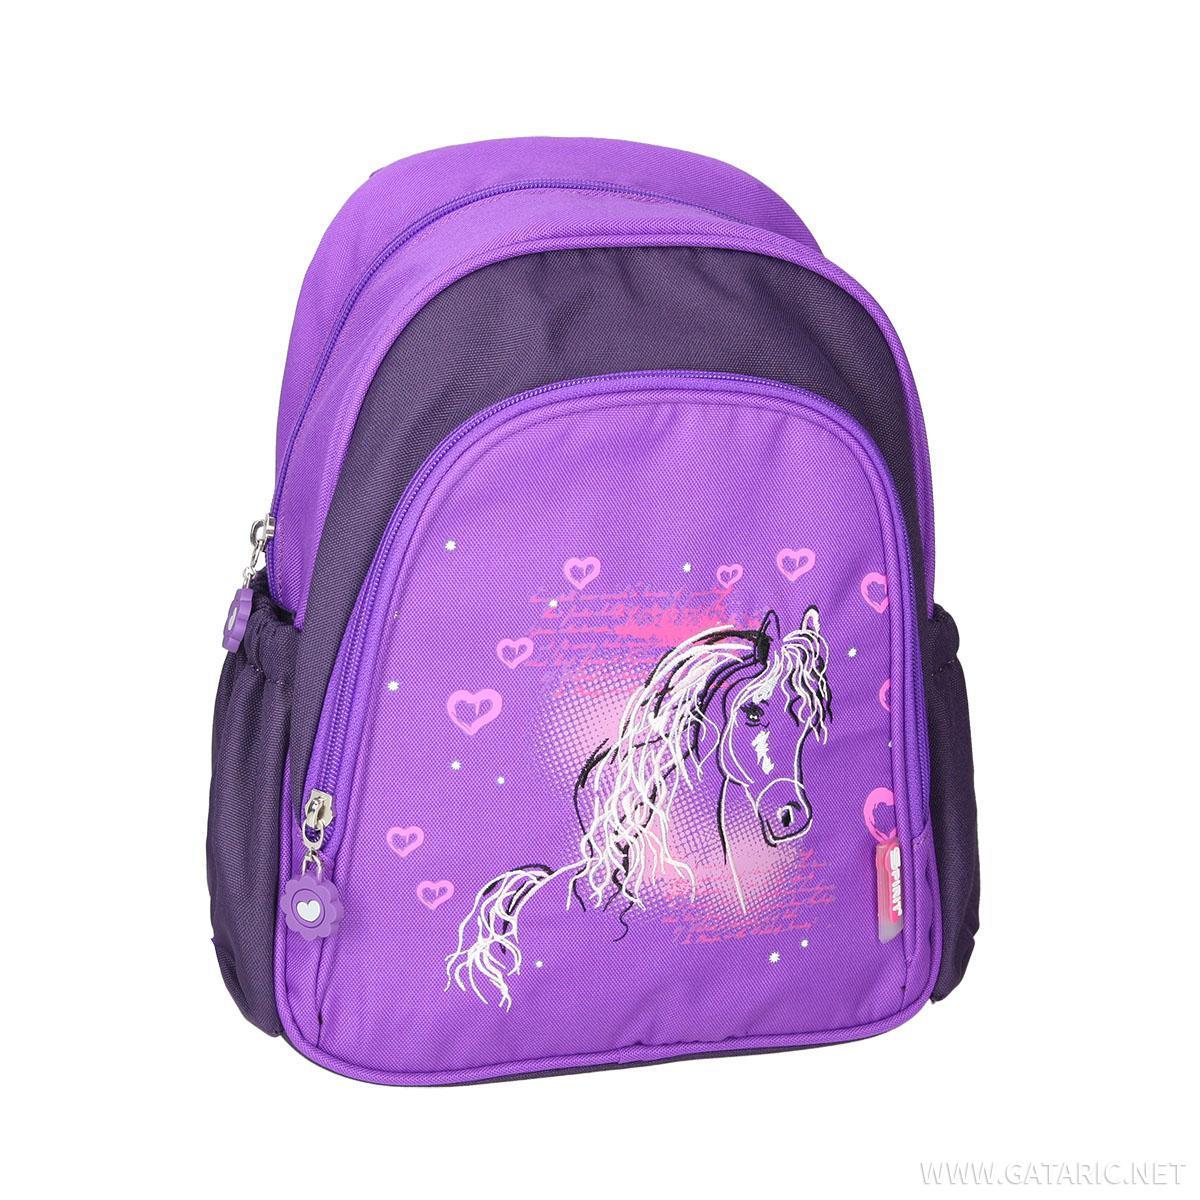 Torba ''Horse'' (Kolekcija UNO)